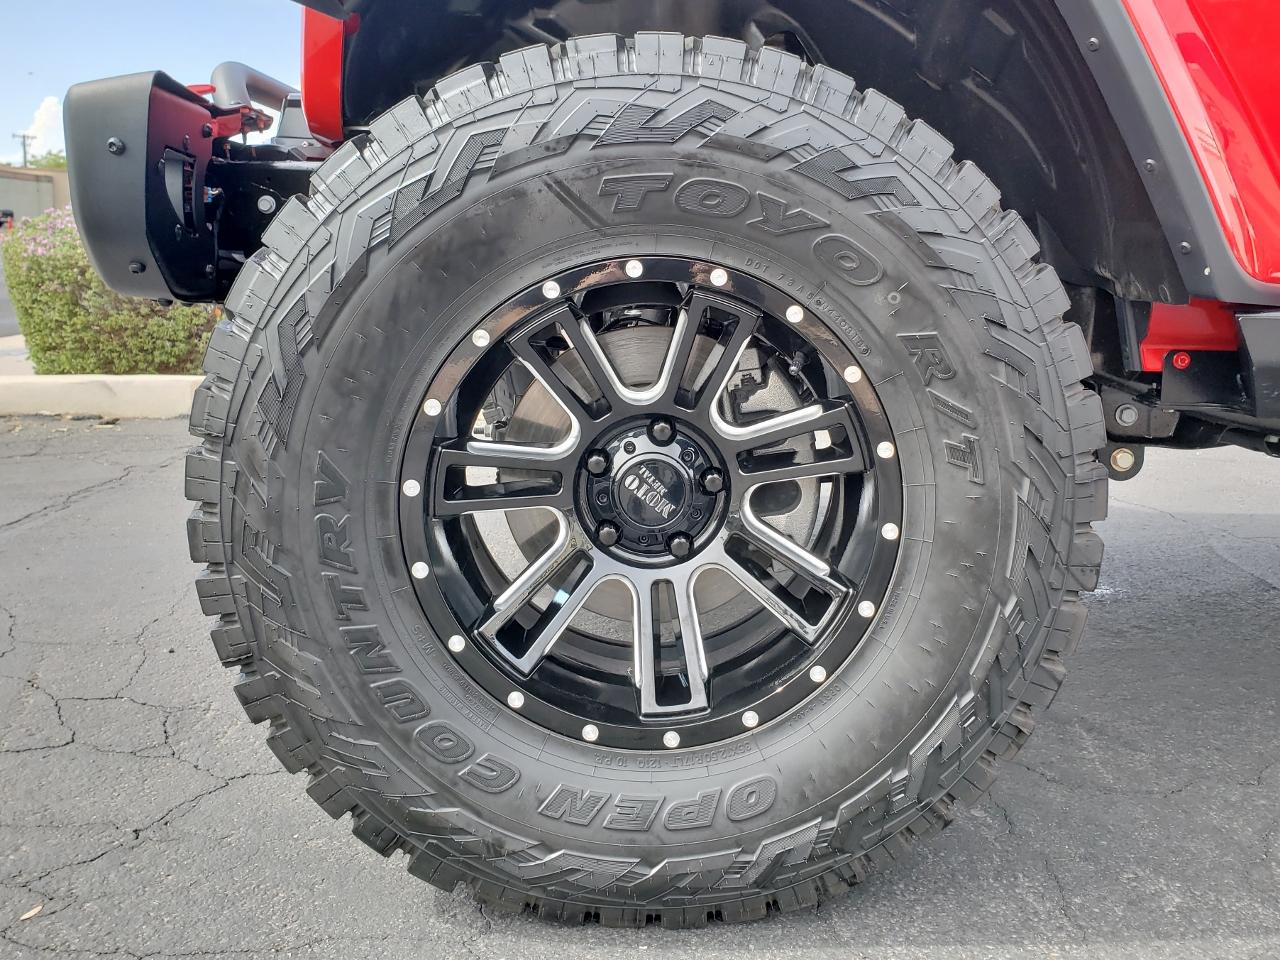 2018 Jeep Wrangler JLU Rubicon